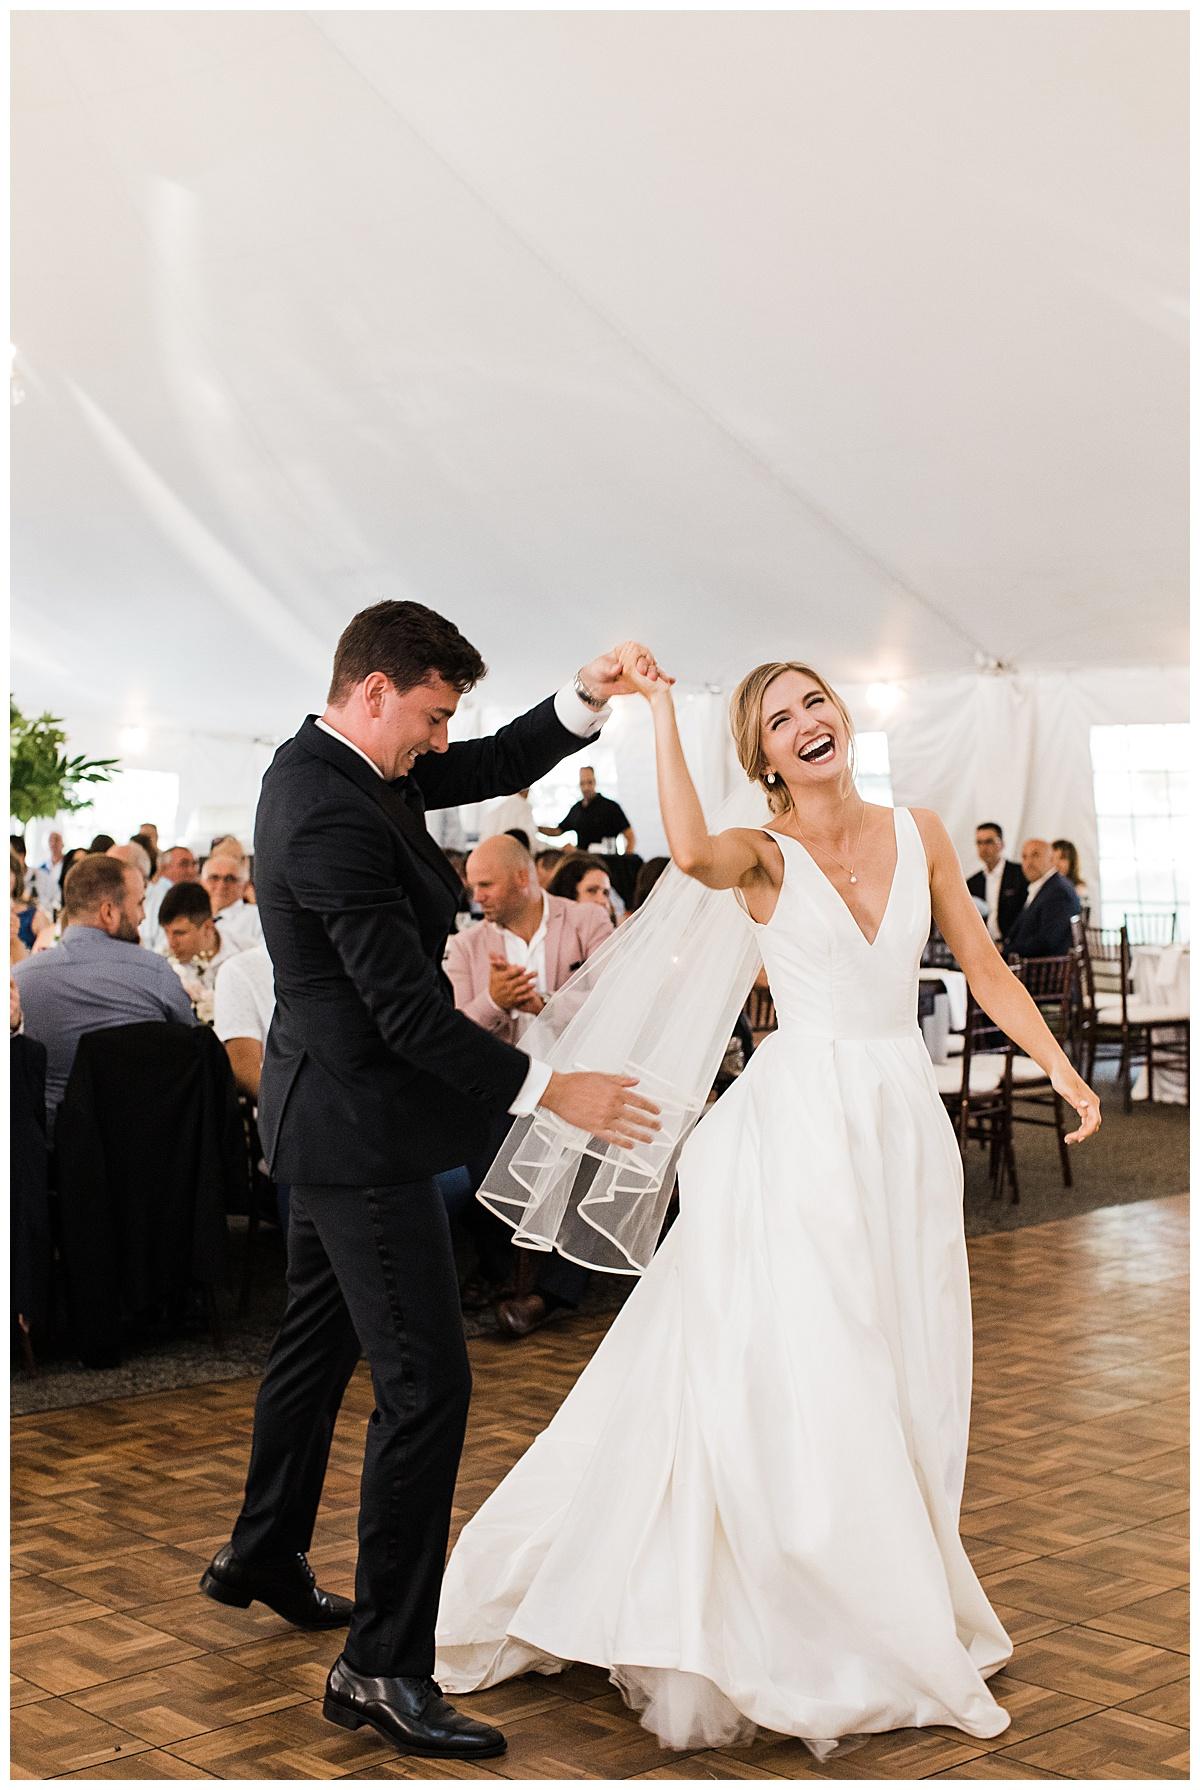 Bride and groom dancing and laughing on dance floor Georgetown,  Ontario wedding  Toronto wedding photographer  3photography